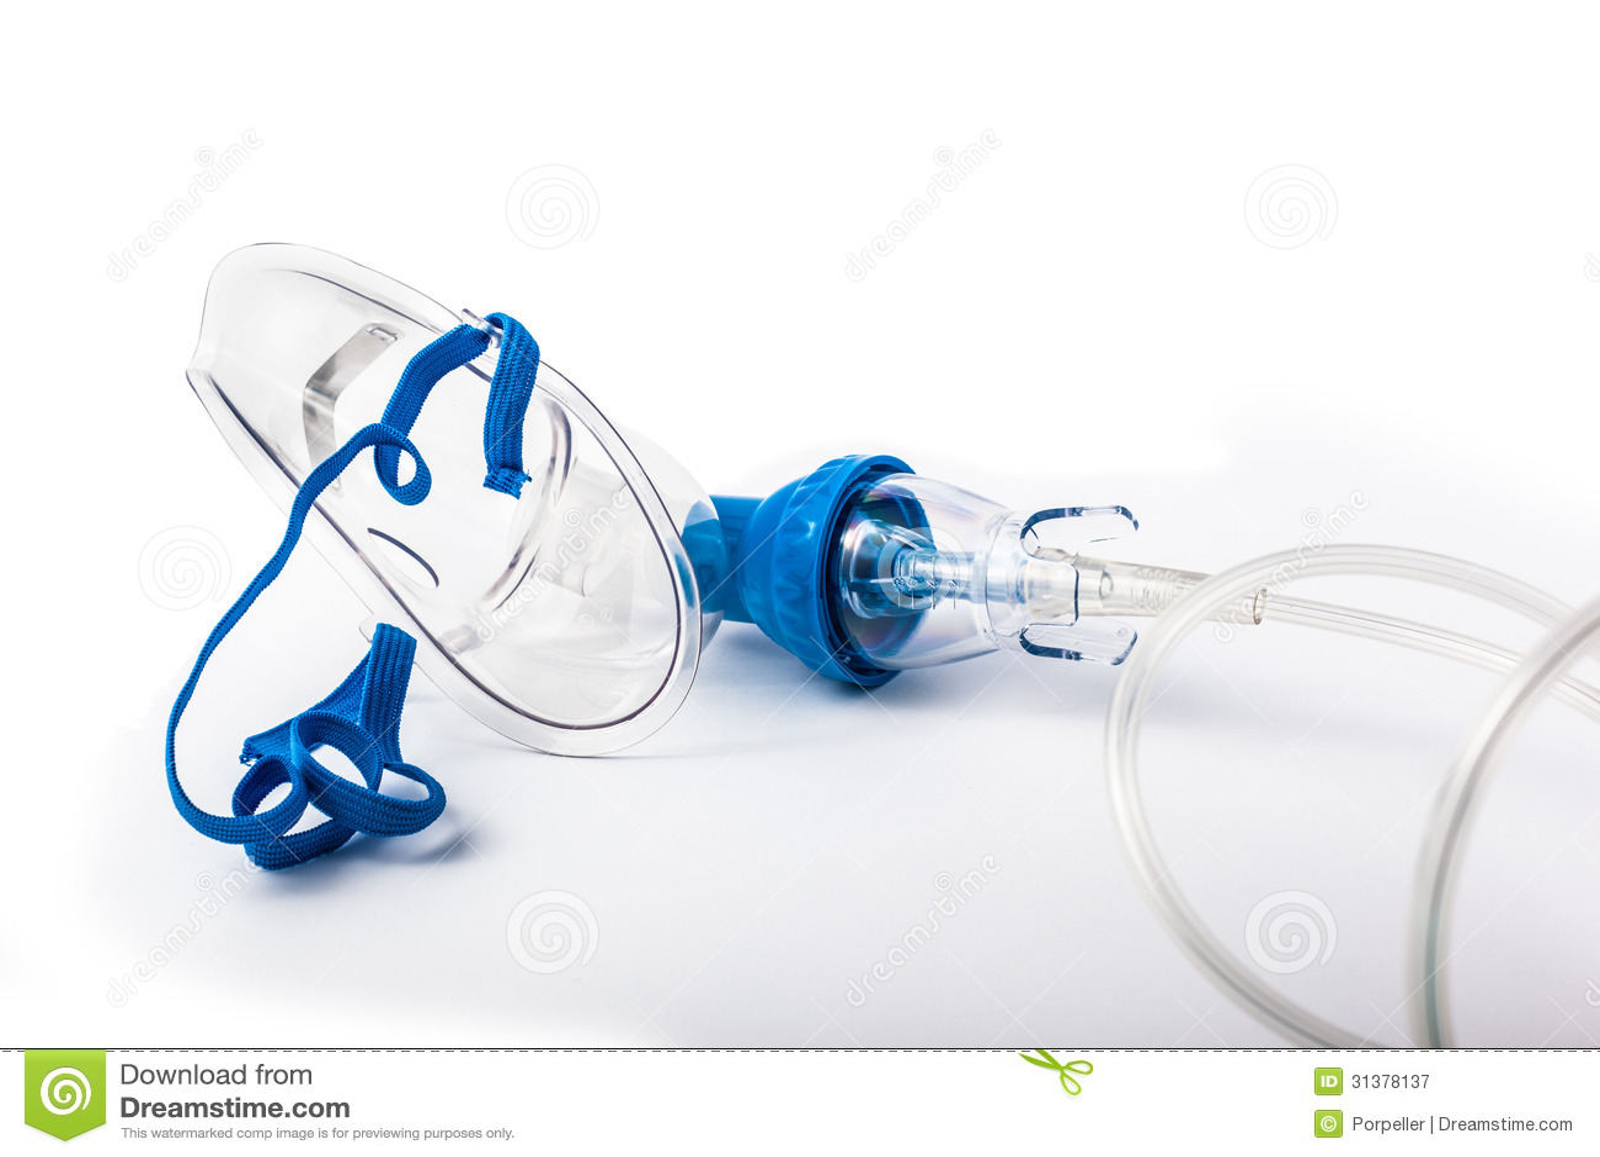 Breathing Mask Medical Oxygen Over White Background